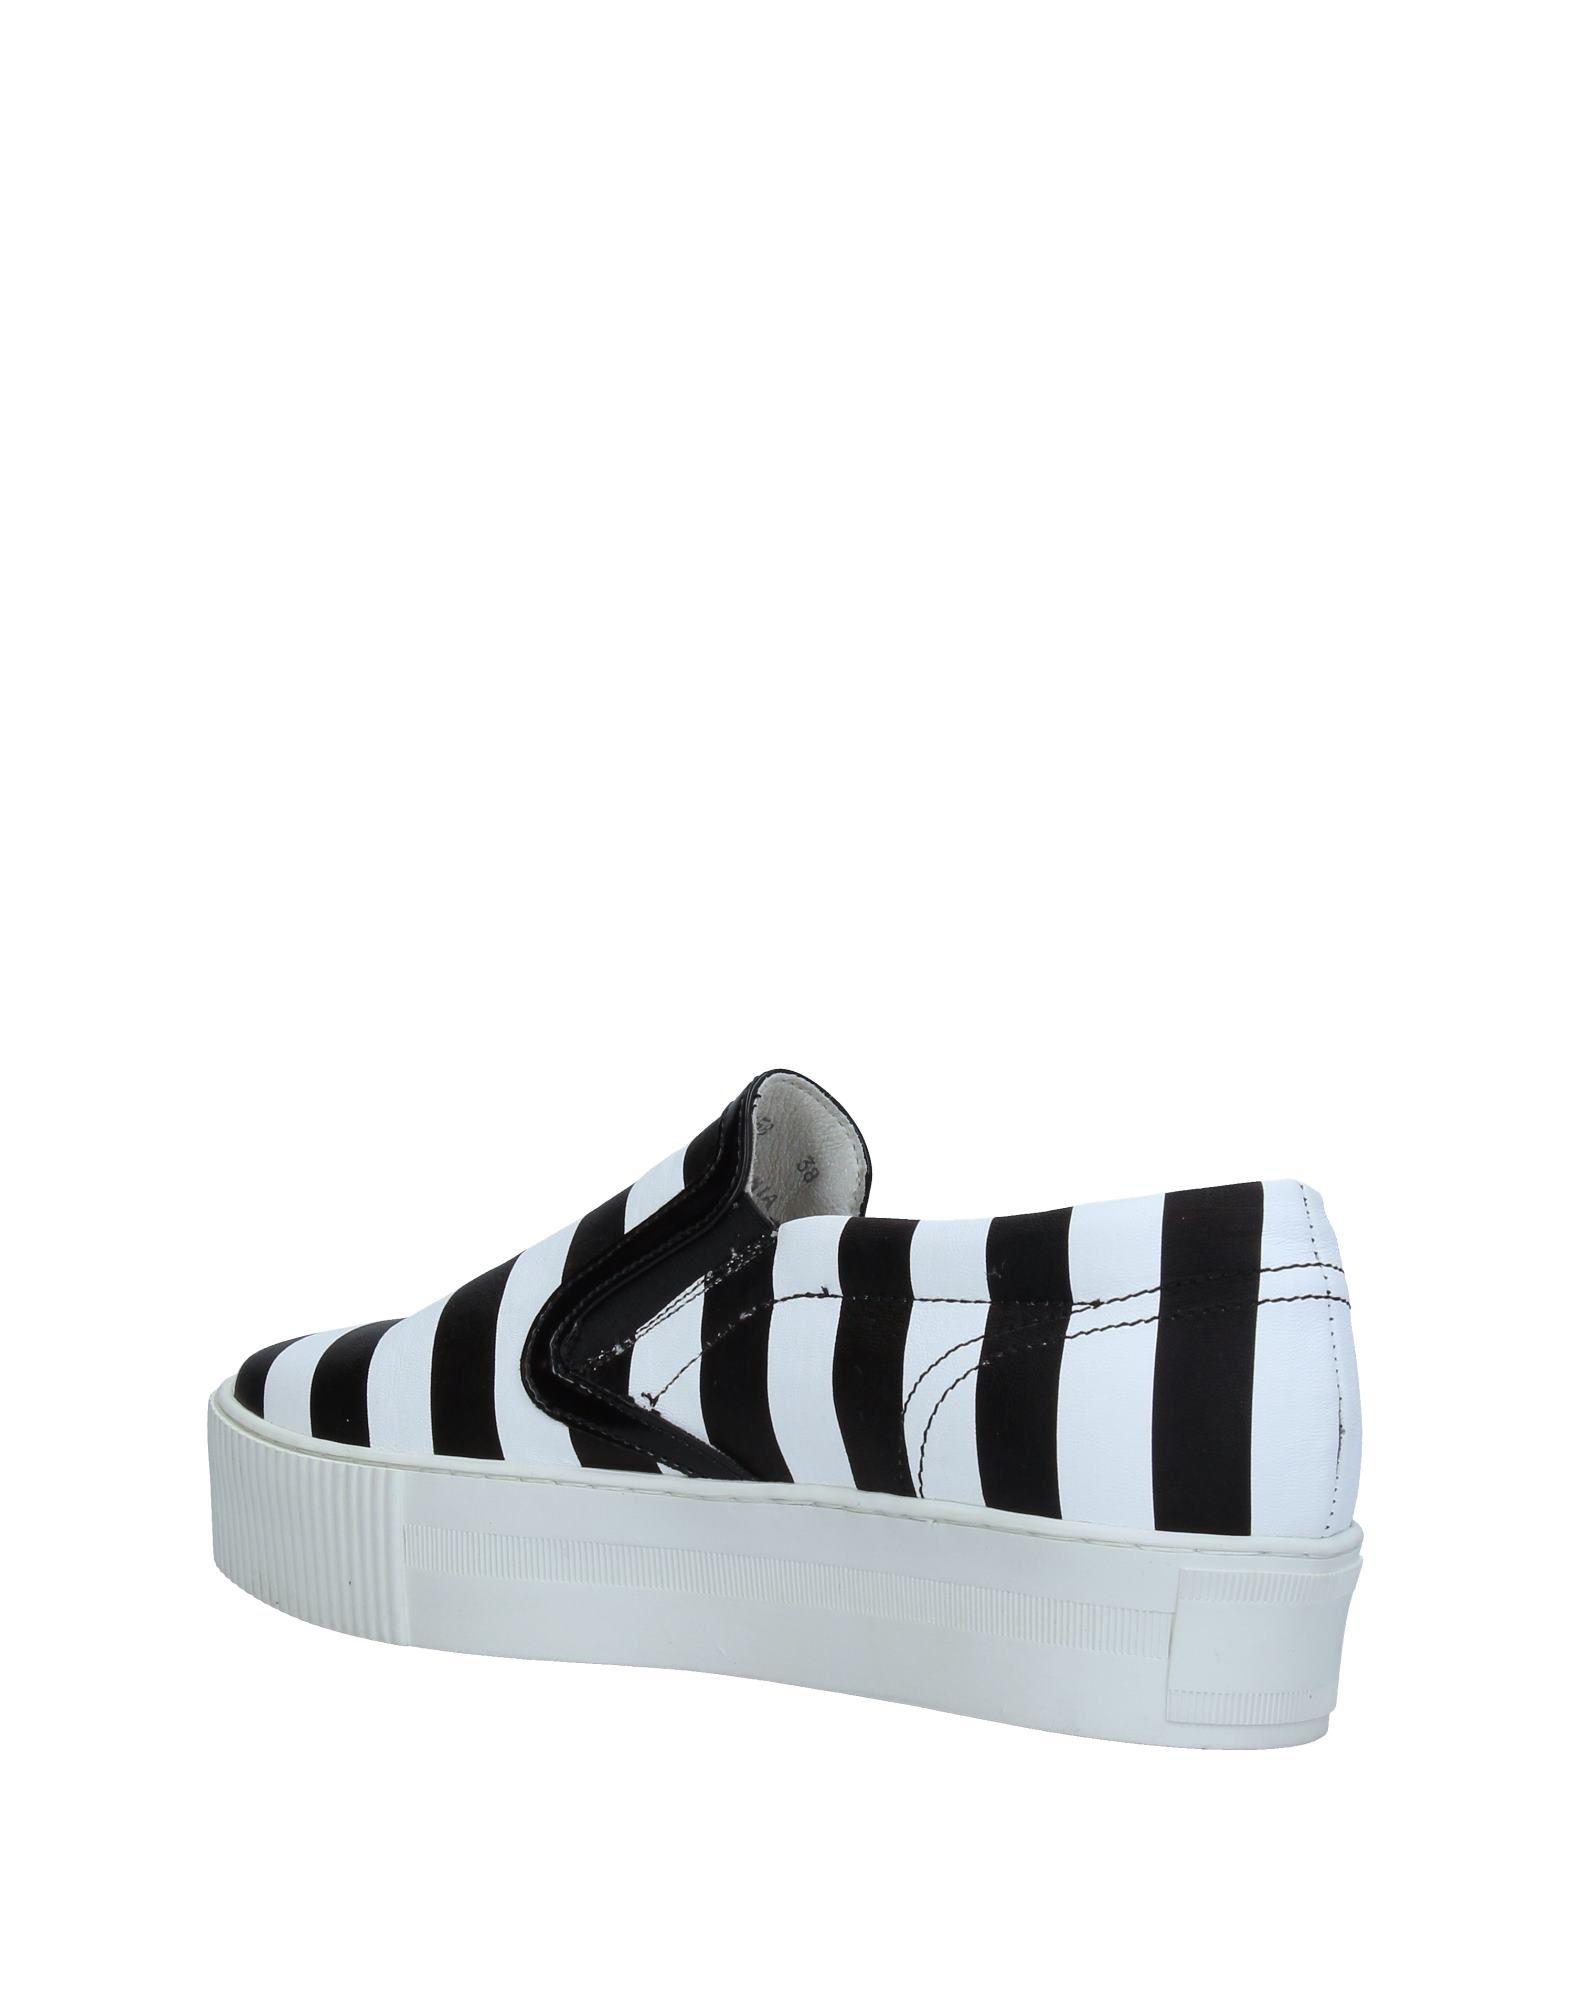 Moda Sneakers Cult Donna Donna Cult - 11359532GJ f77543